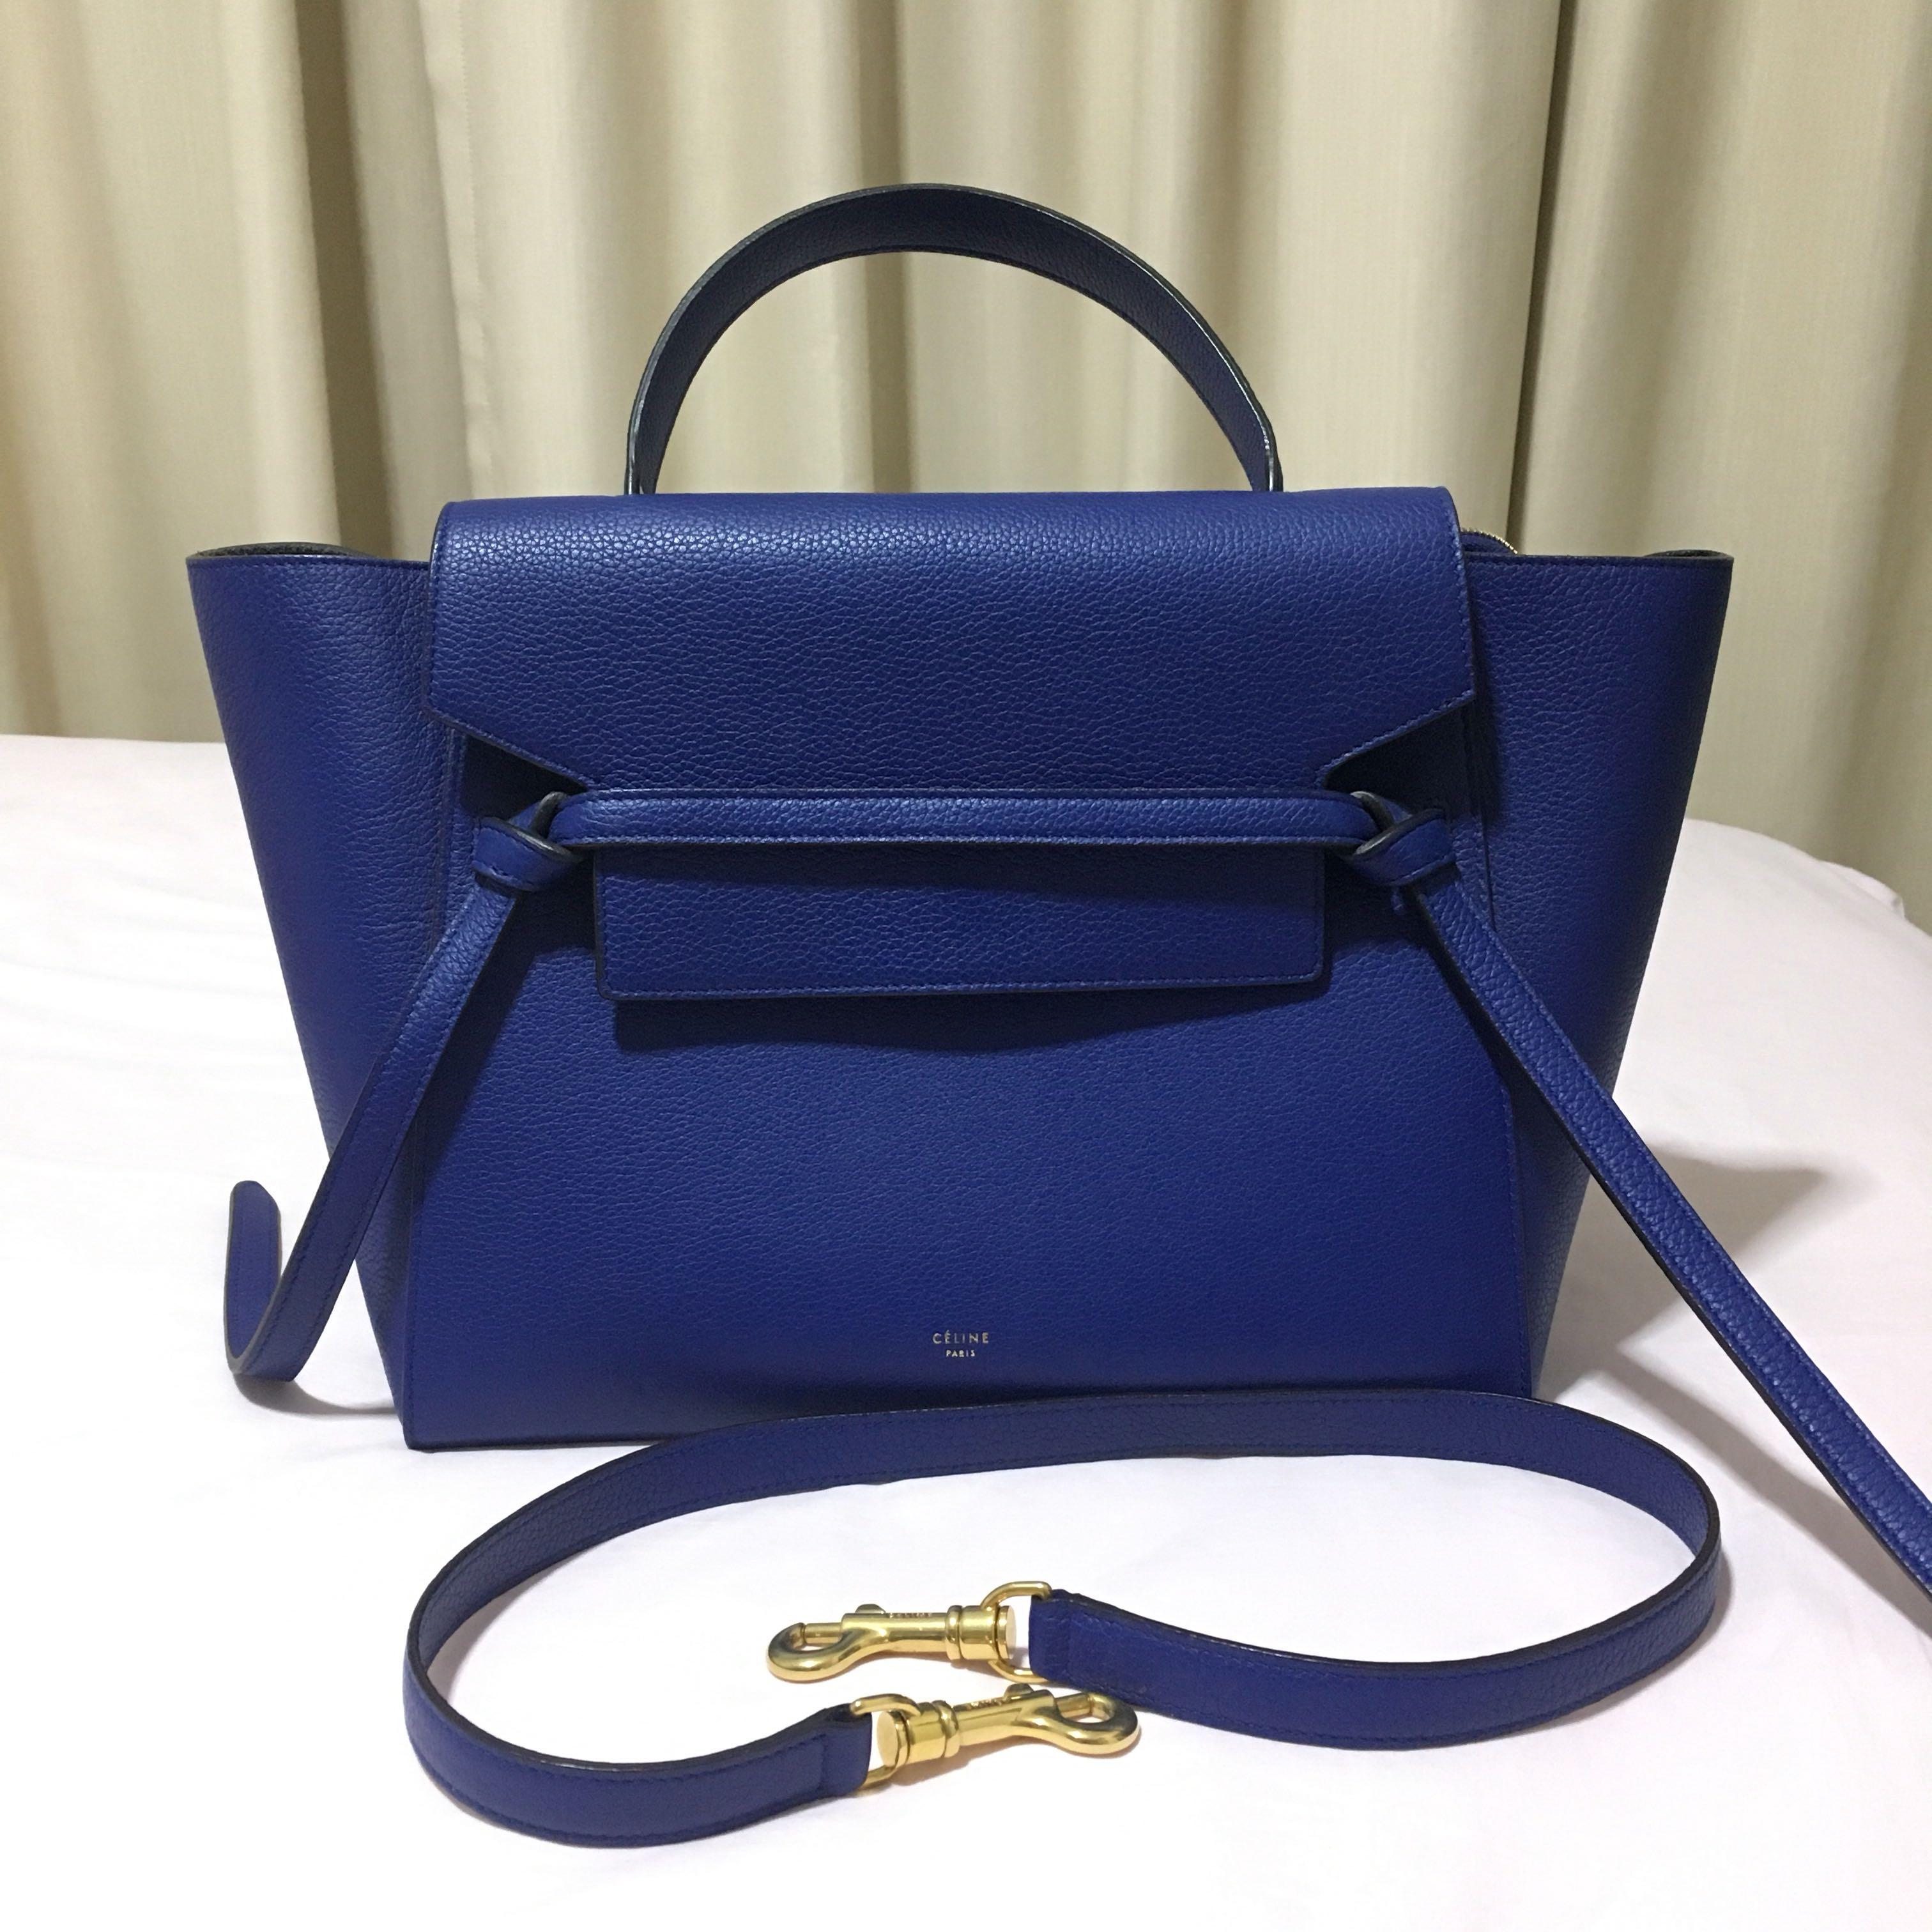 Celine mini belt bag in indigo womens fashion bags wallets on carousell jpg  3024x3024 Celine mini 2ebfa6d2c9